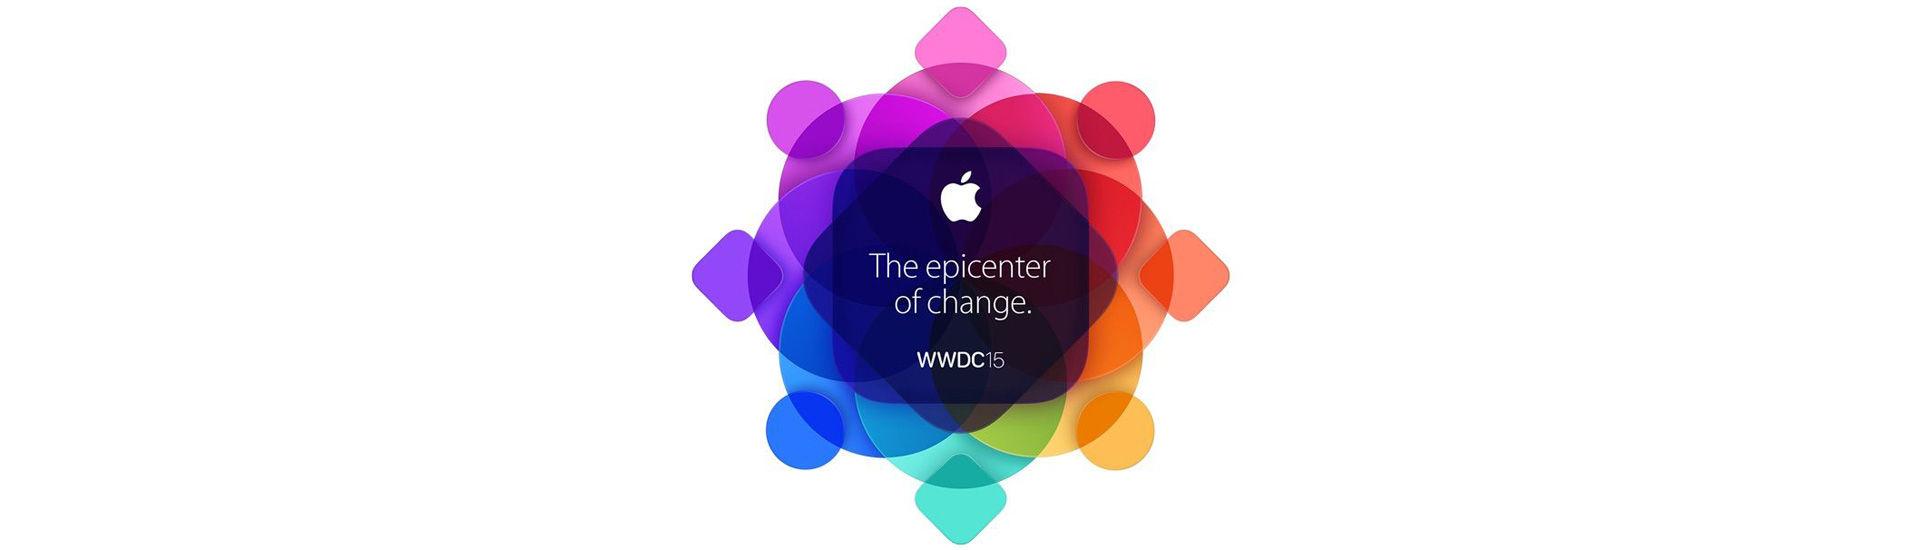 WWDC15_img1920x550_topSlider